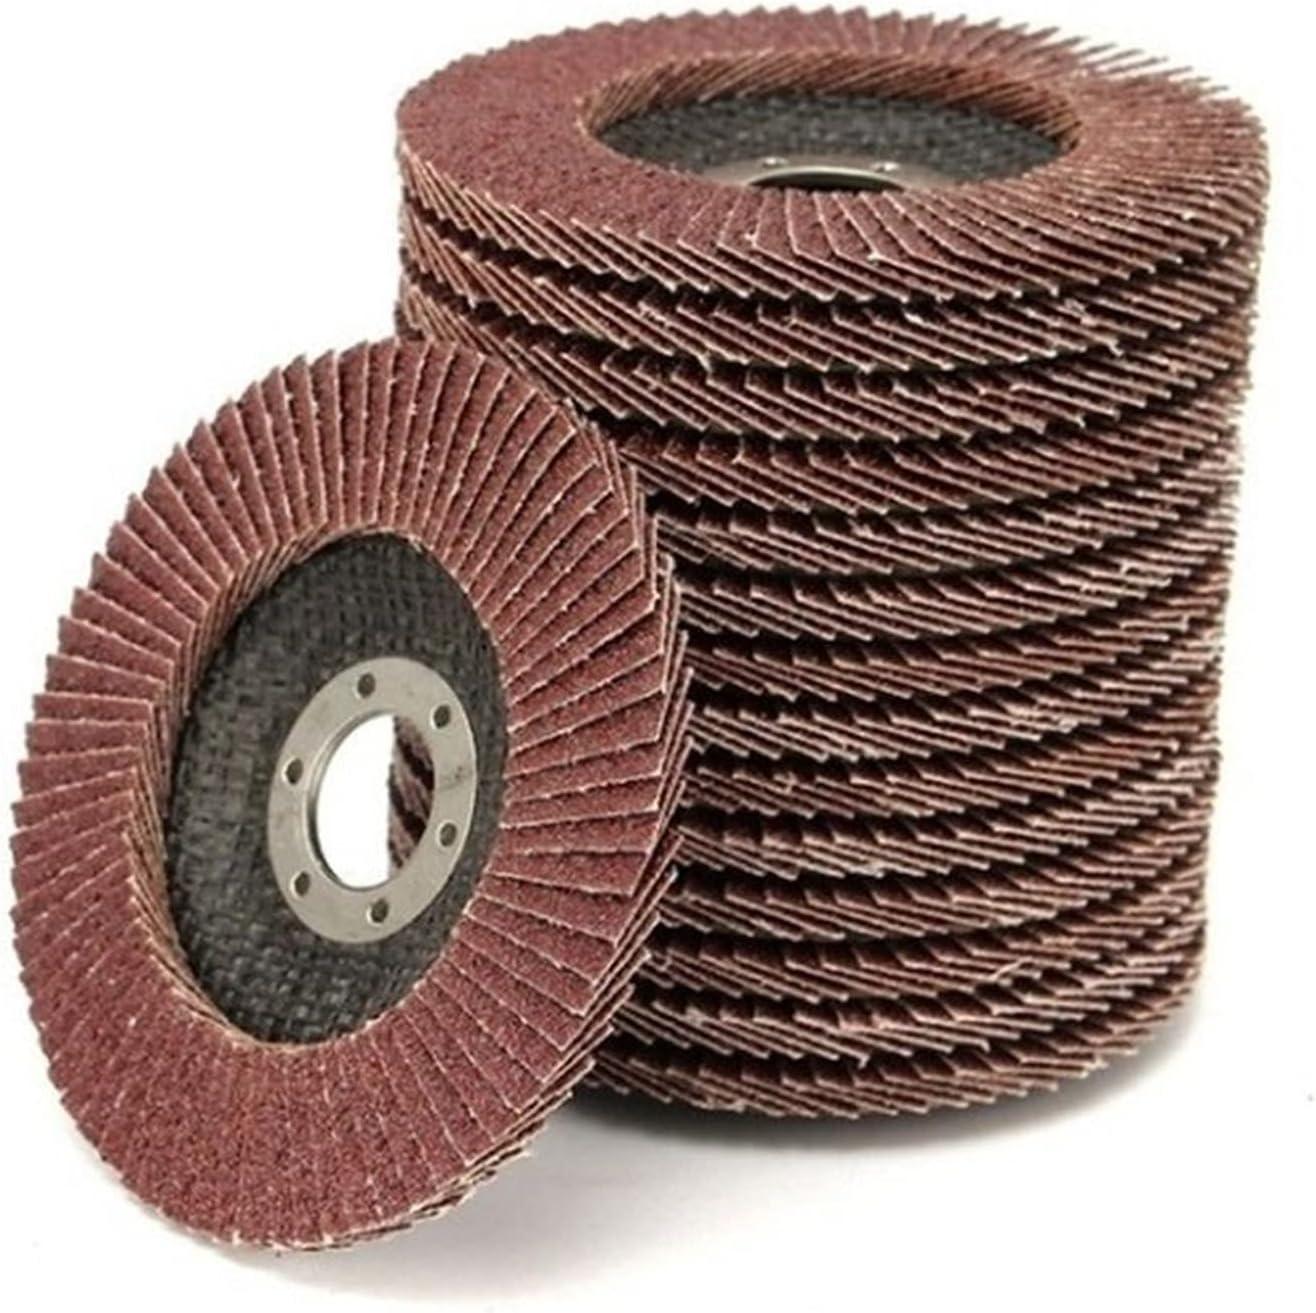 Cutting wheele 10Pcs Gifts 100mm Flap Sanding 60 Grit New Shipping Free Shipping Discs 40 120 80